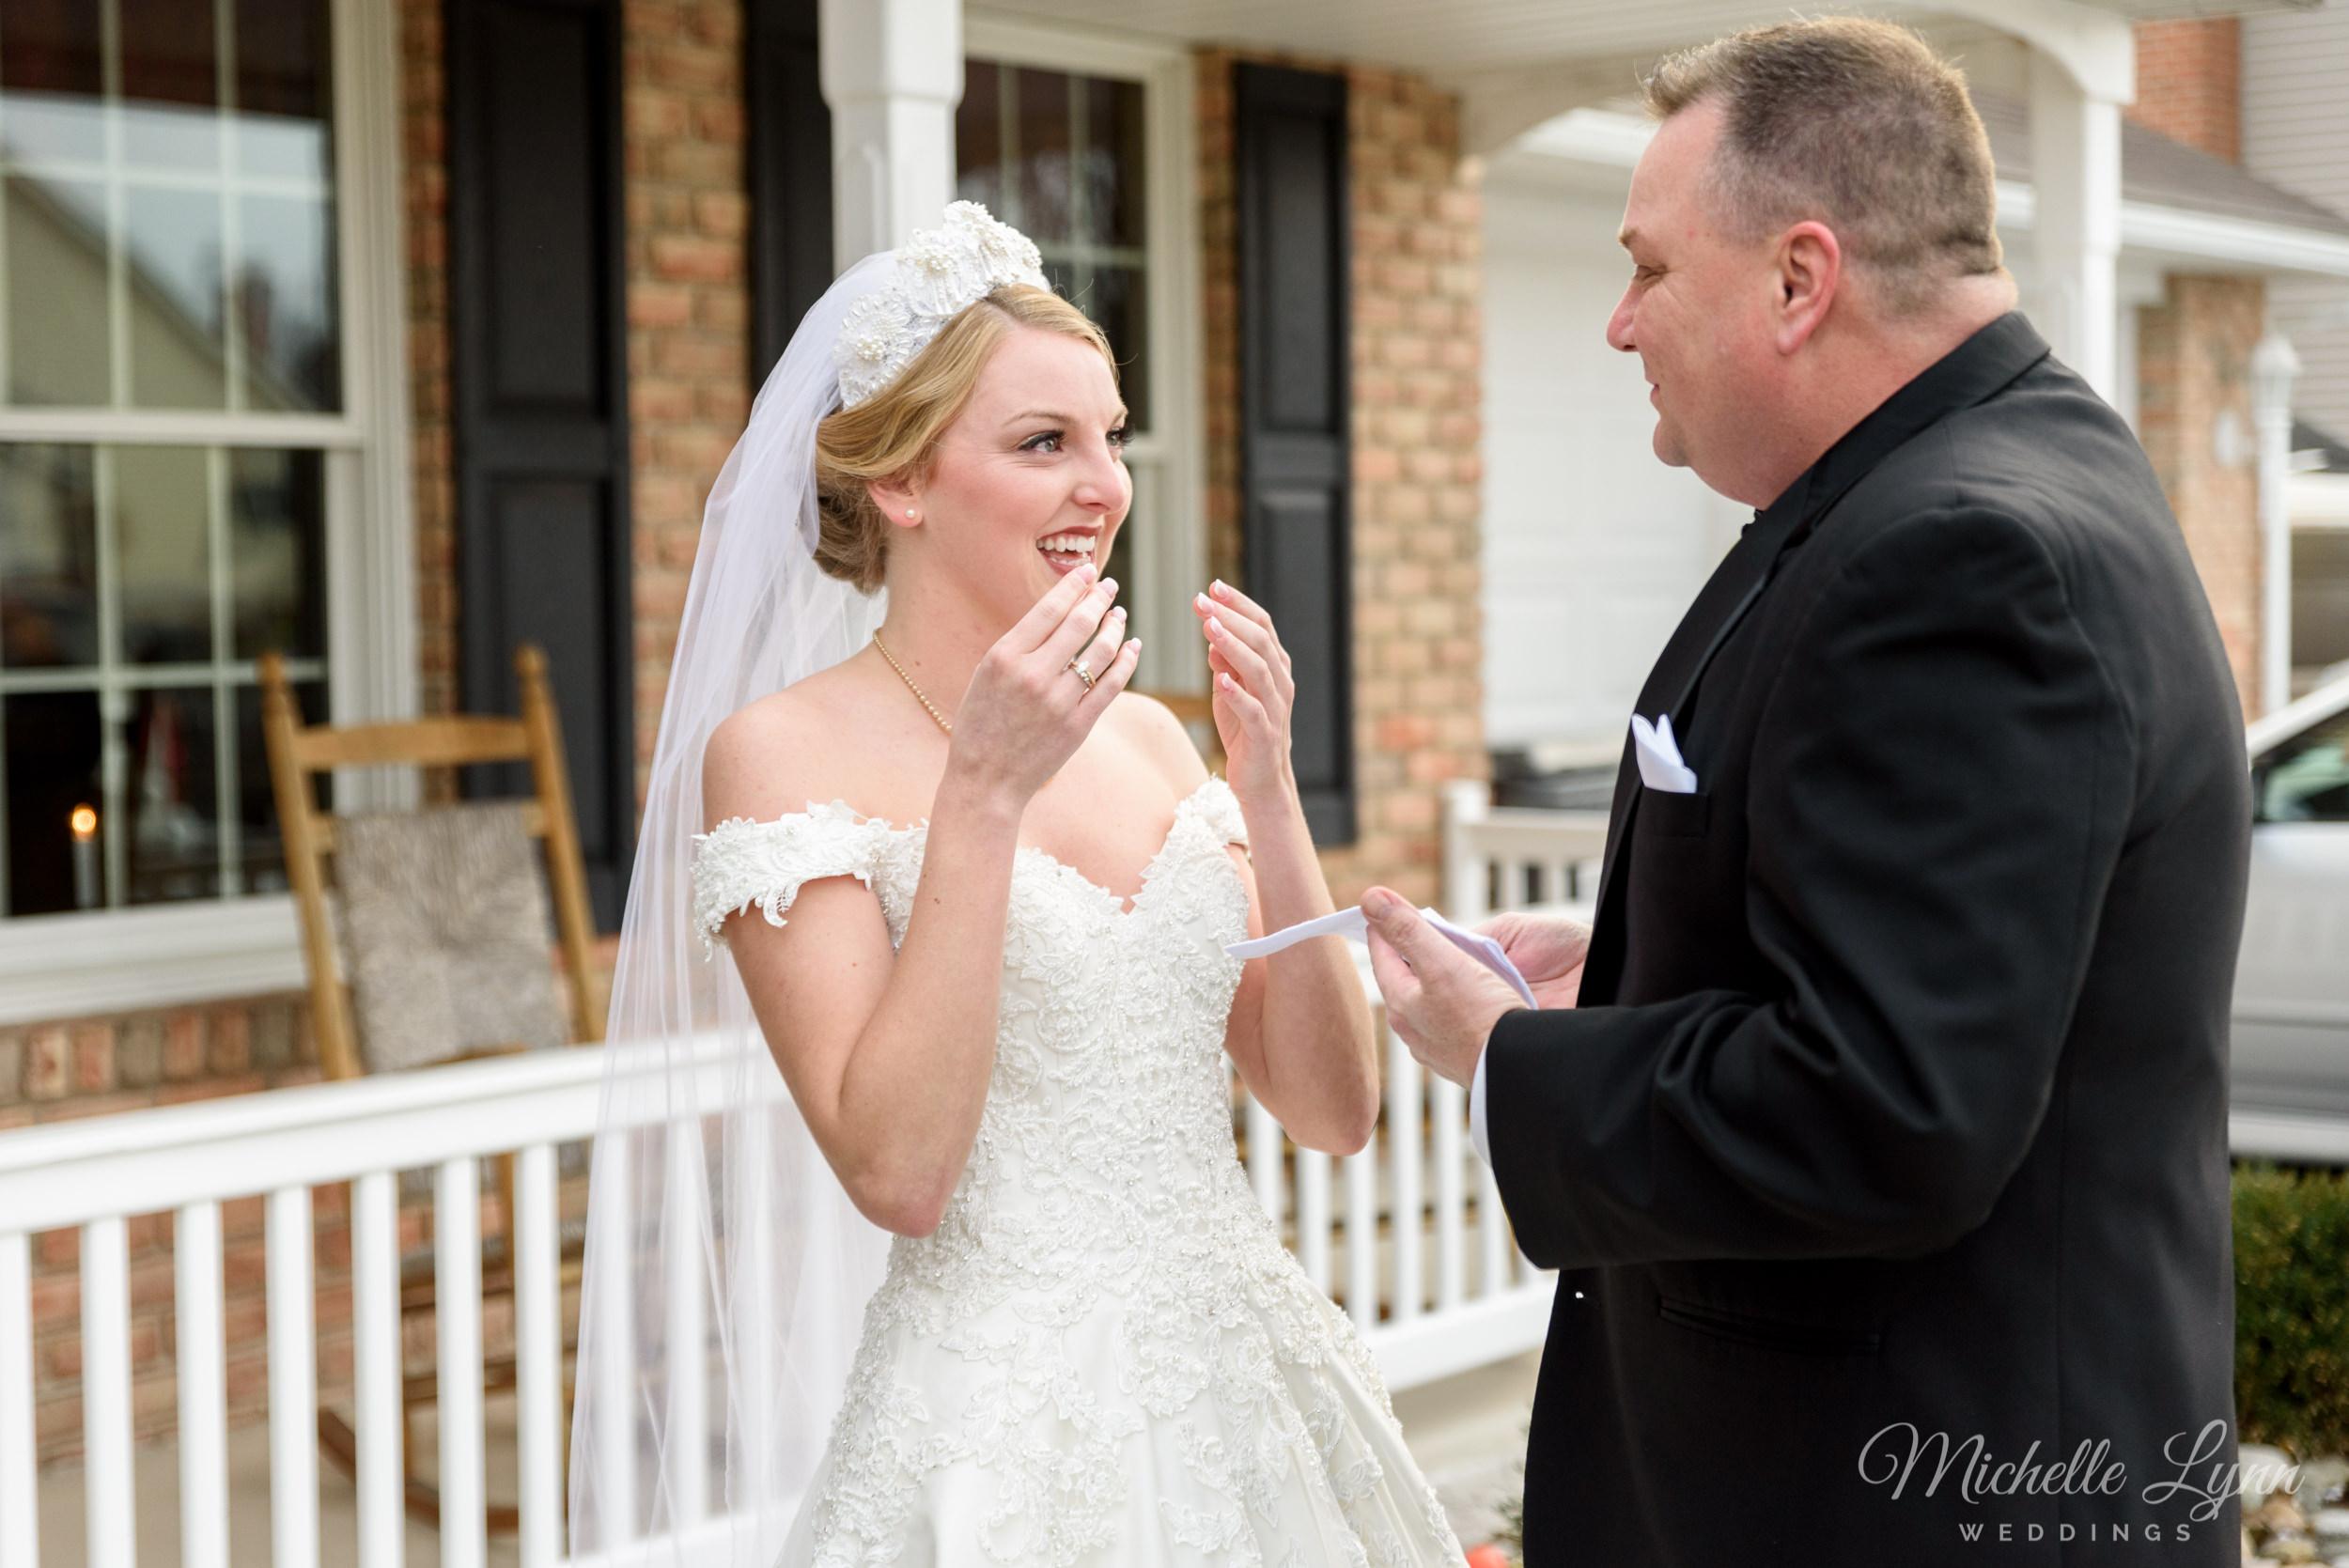 william-penn-inn-wedding-photography-mlw-24.jpg